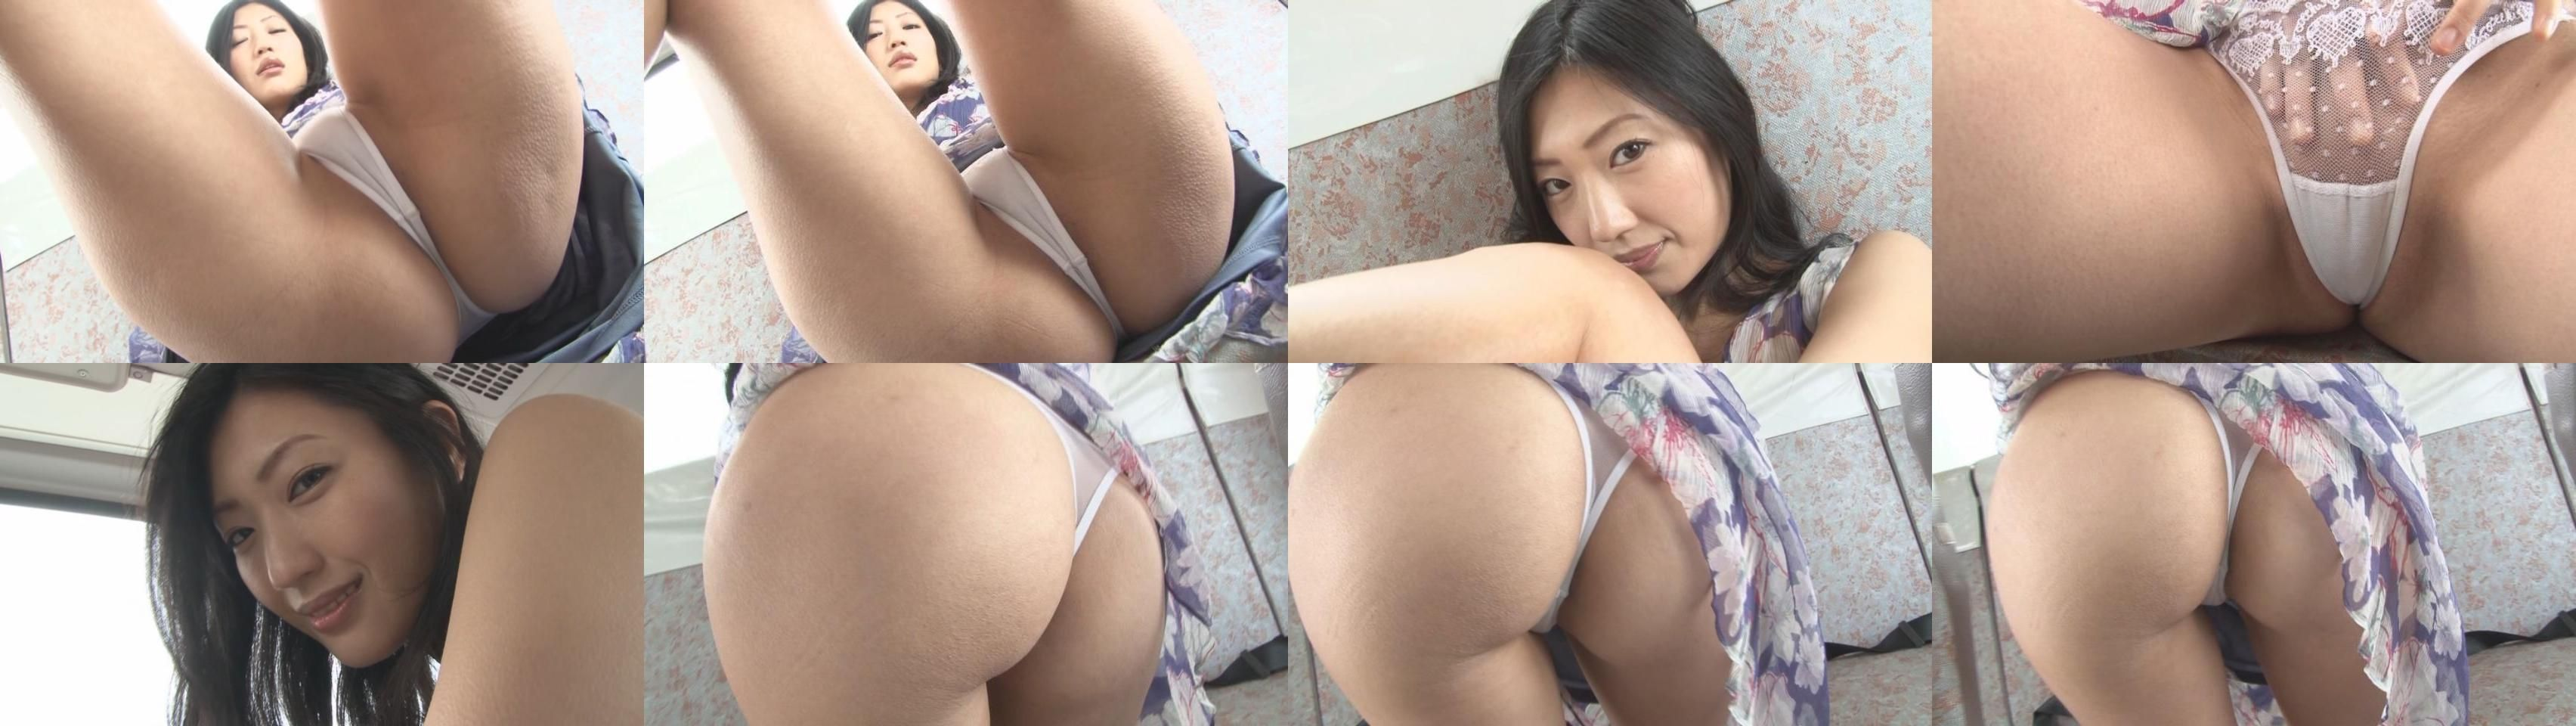 http://livedoor.blogimg.jp/idlekun-cutenadeshiko/imgs/6/0/600e973f.jpg